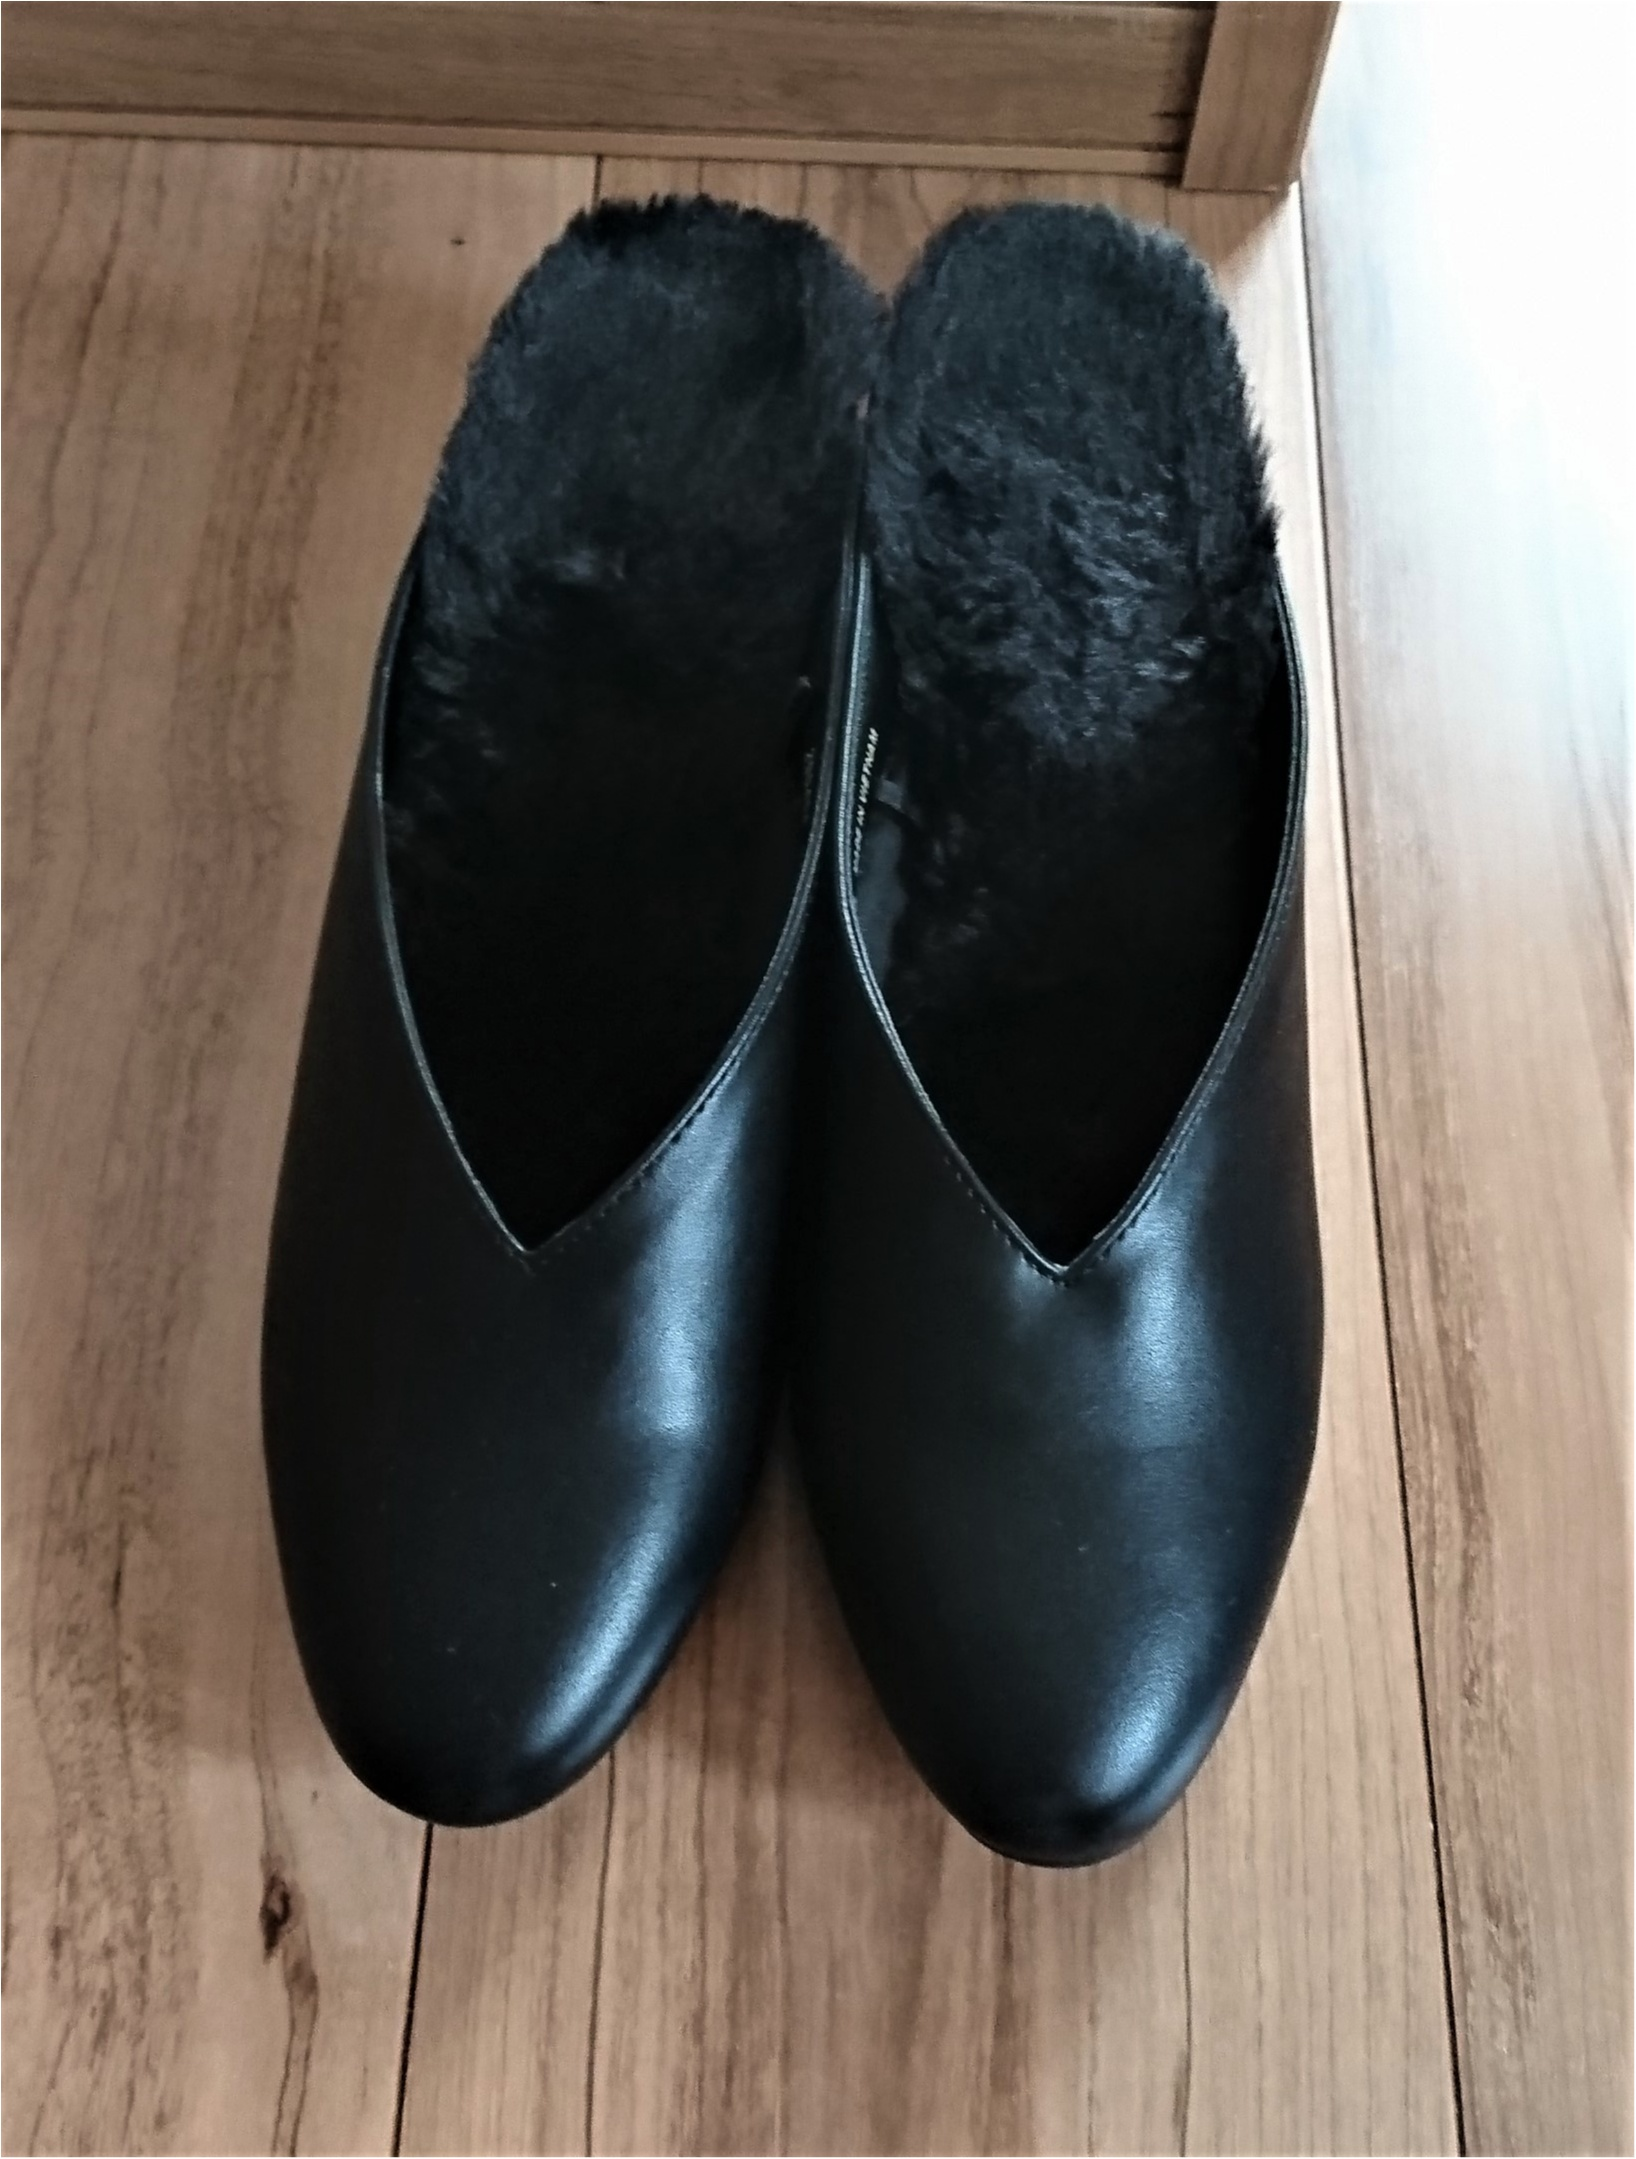 【GUの秋靴】お洒落は足元から♡秋シューズcoordinate!_5